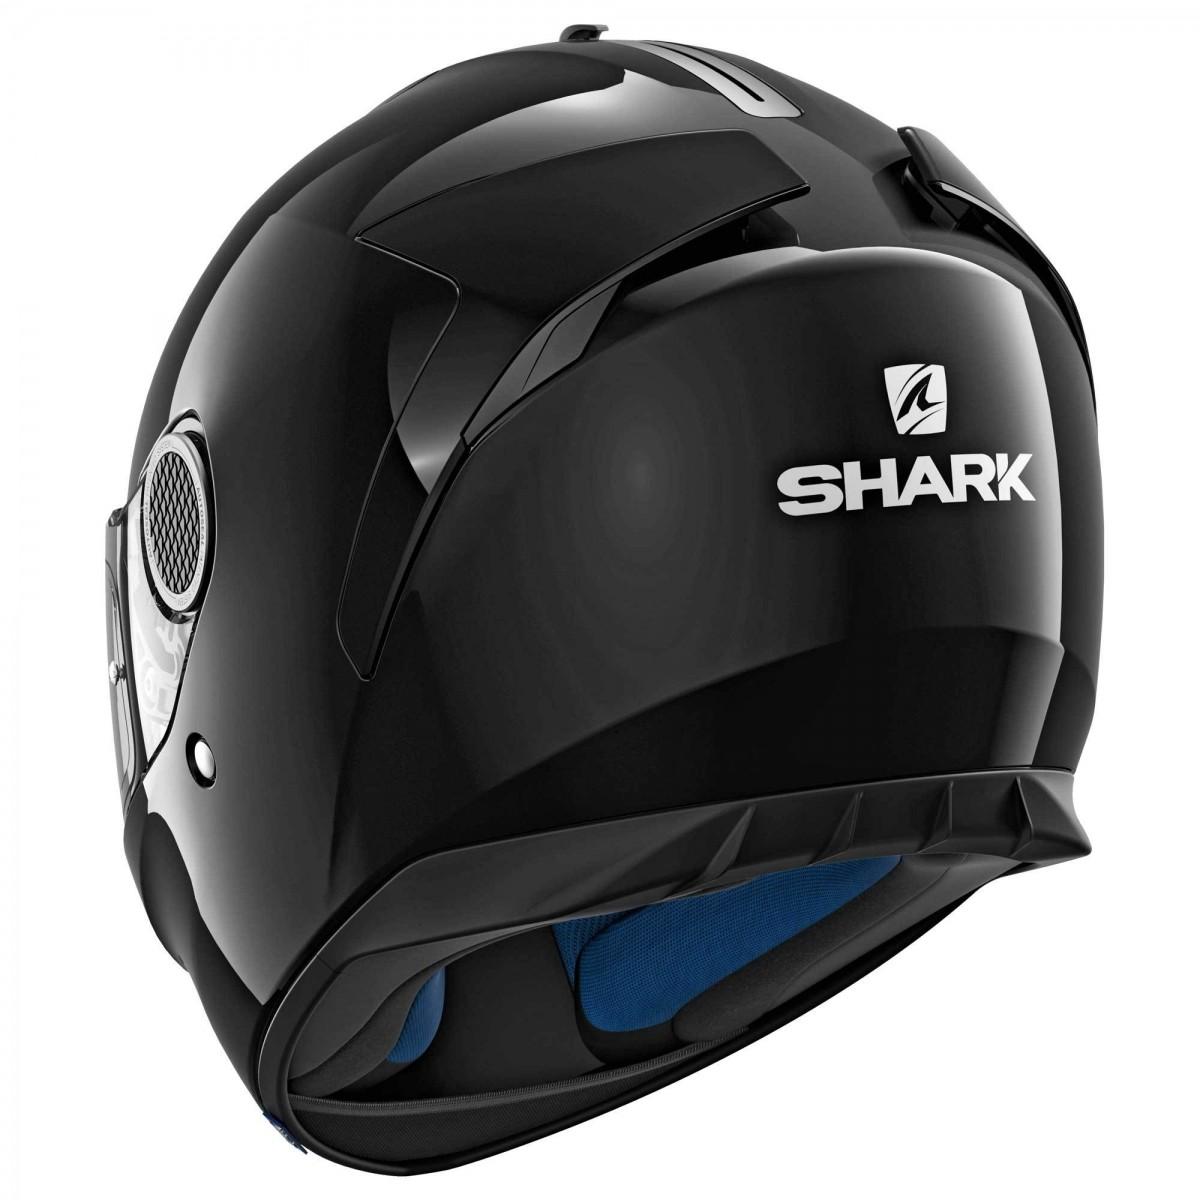 Capacete Shark Spartan APIC SS P BLK  - Nova Suzuki Motos e Acessórios